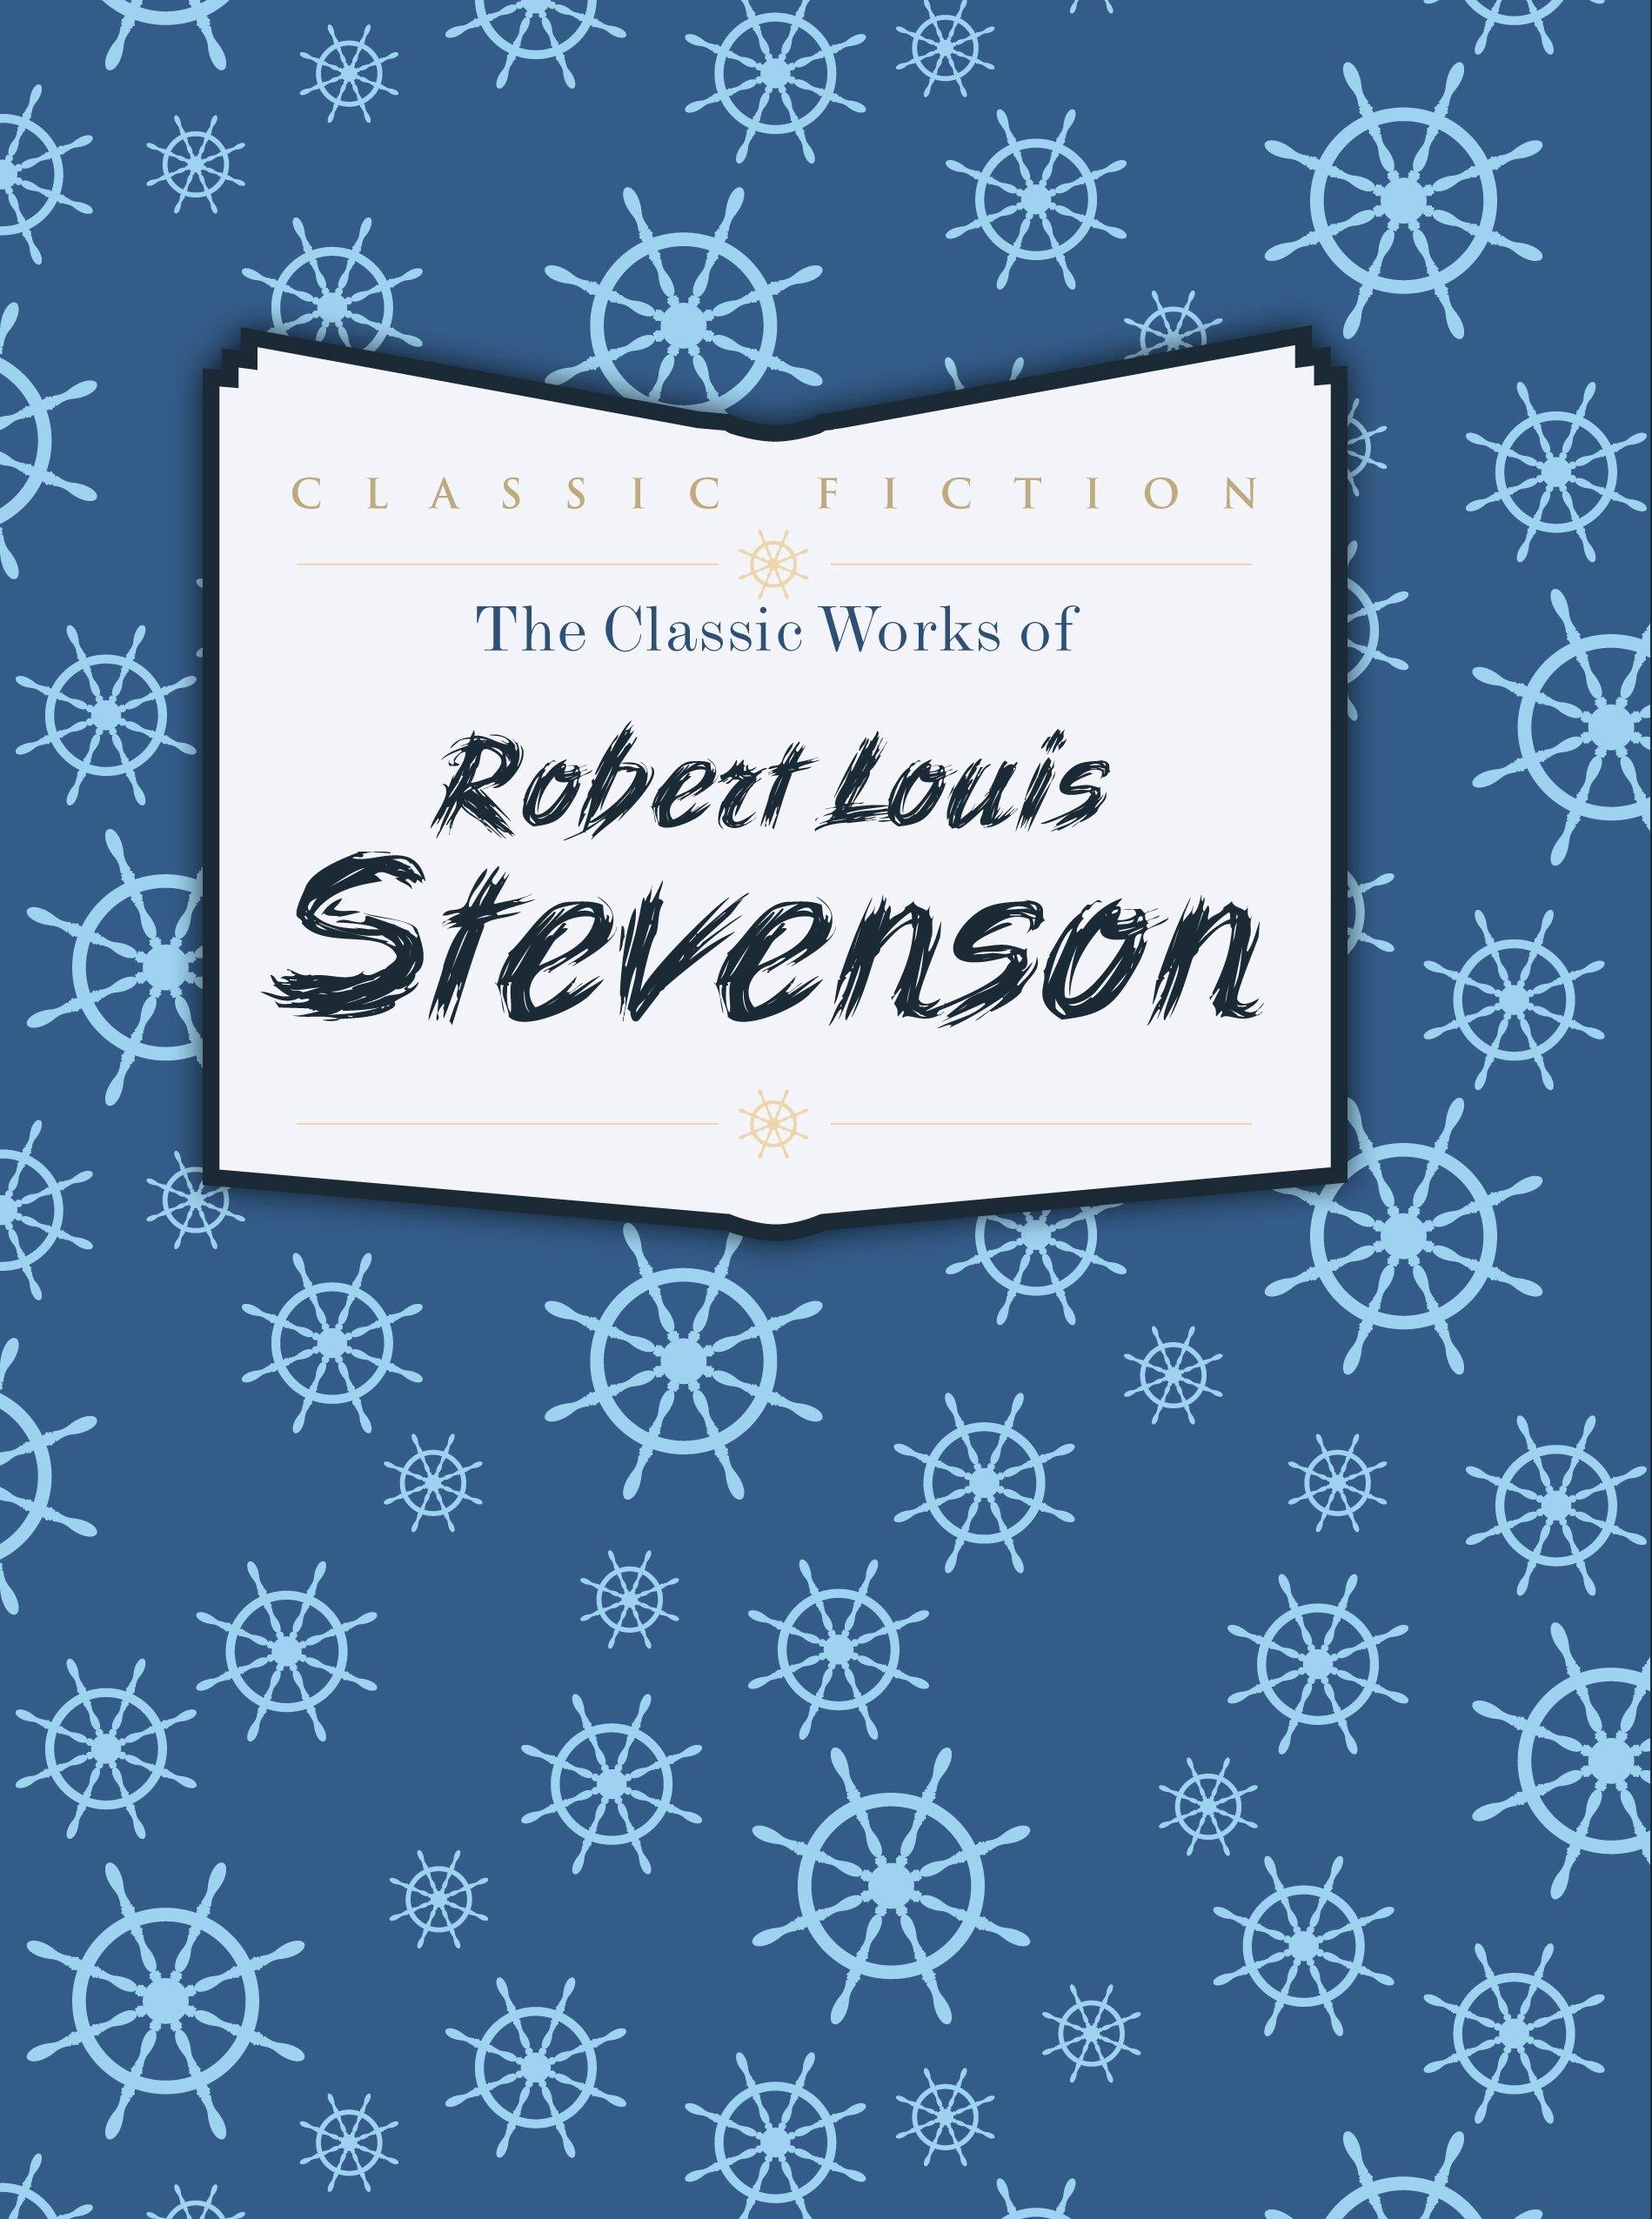 Classic Works of Robert Louis Stevenson (HB) robert louis stevenson the works of robert louis stevenson – swanston edition volume 6